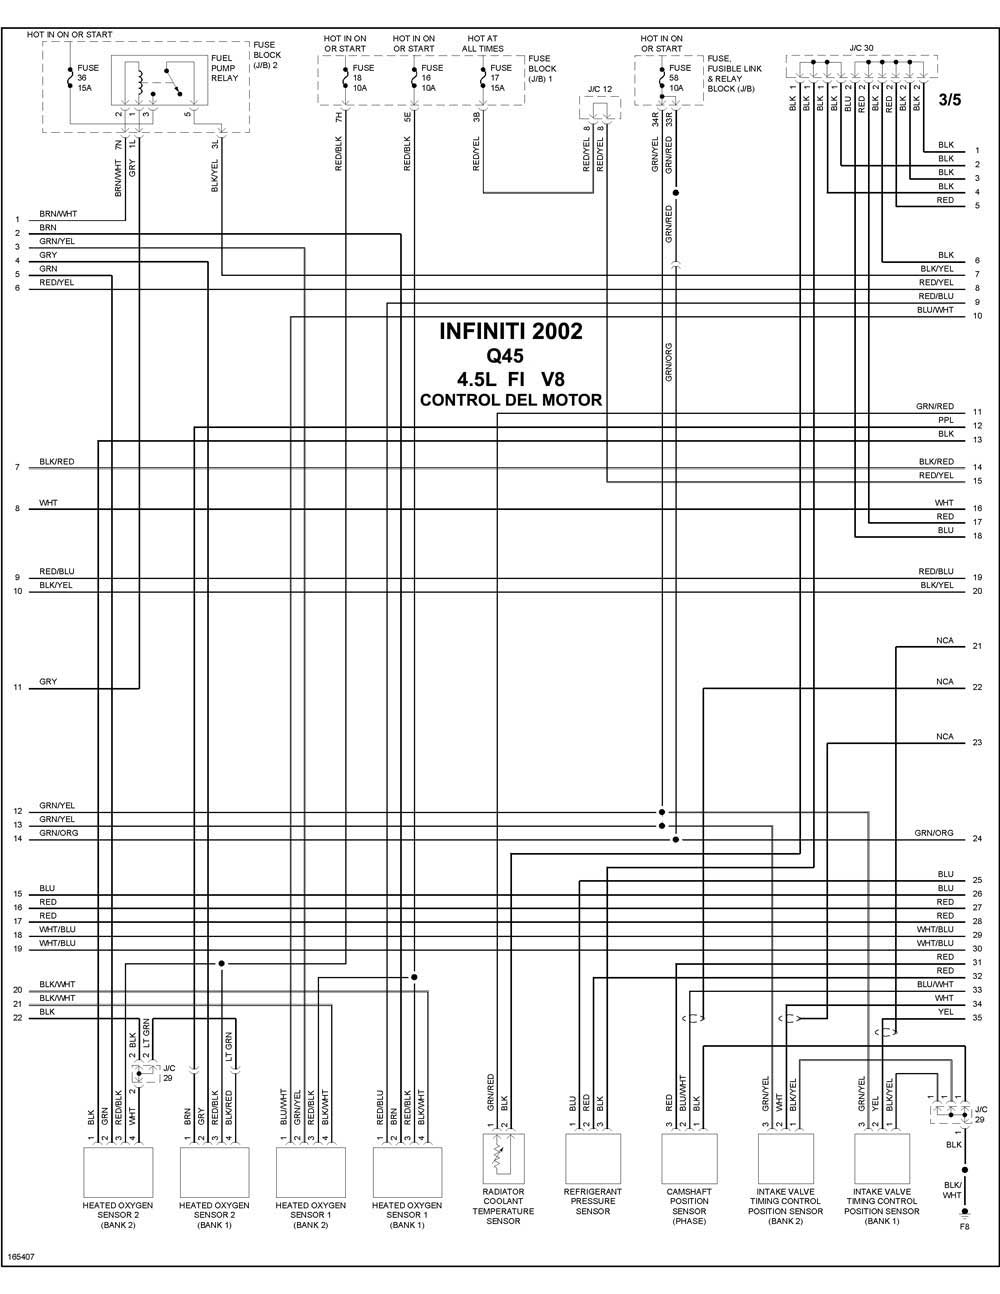 infiniti - diagramas control del motor 2002 - graphics - esquemas